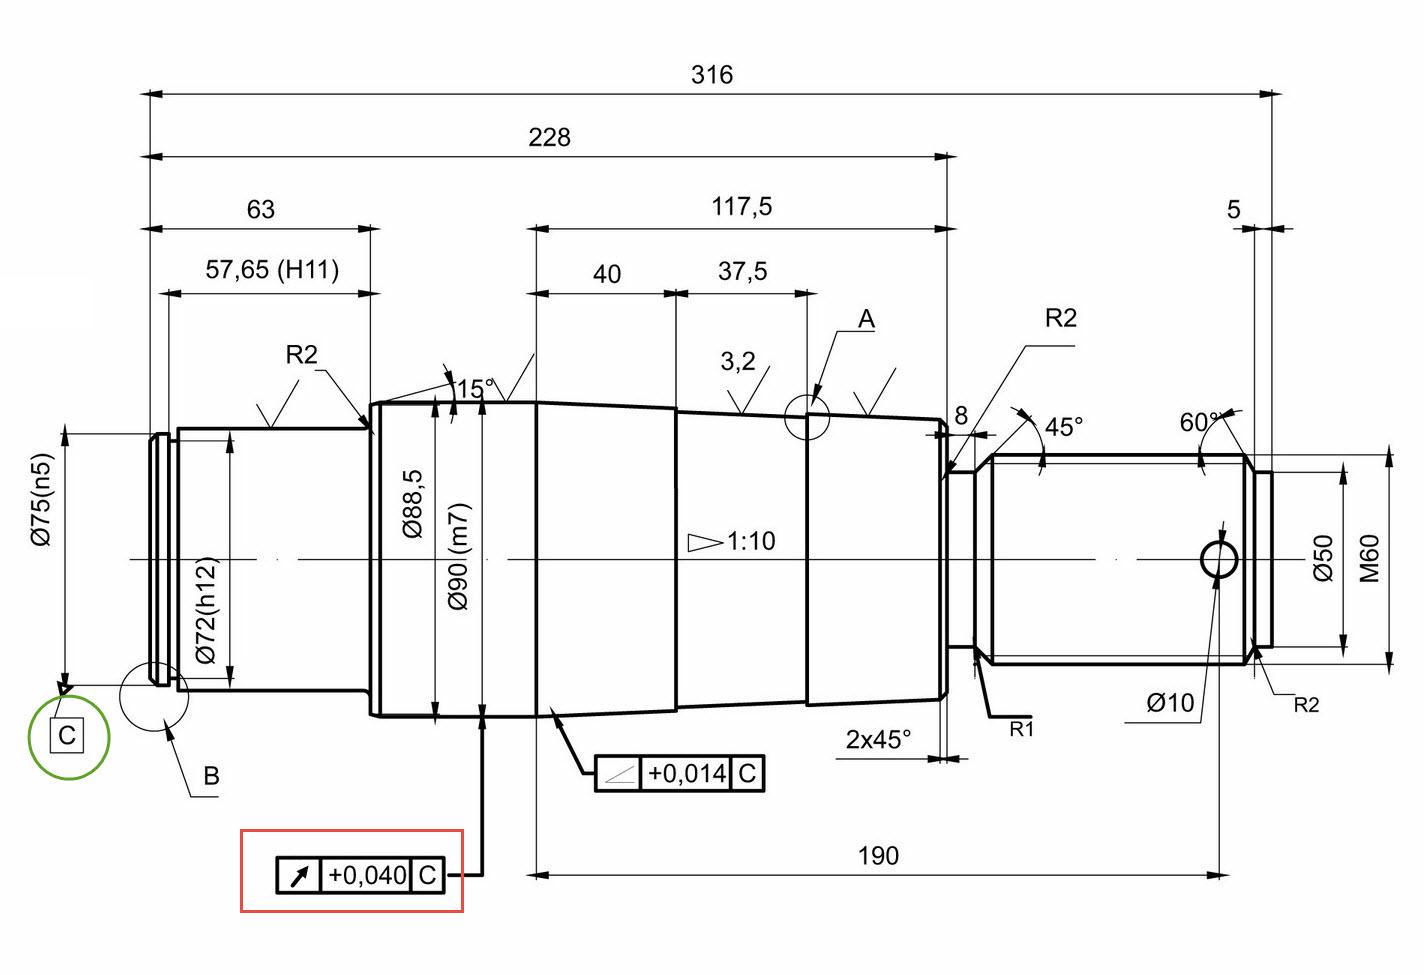 Cadforyou Geometric Tolerances In Product Design